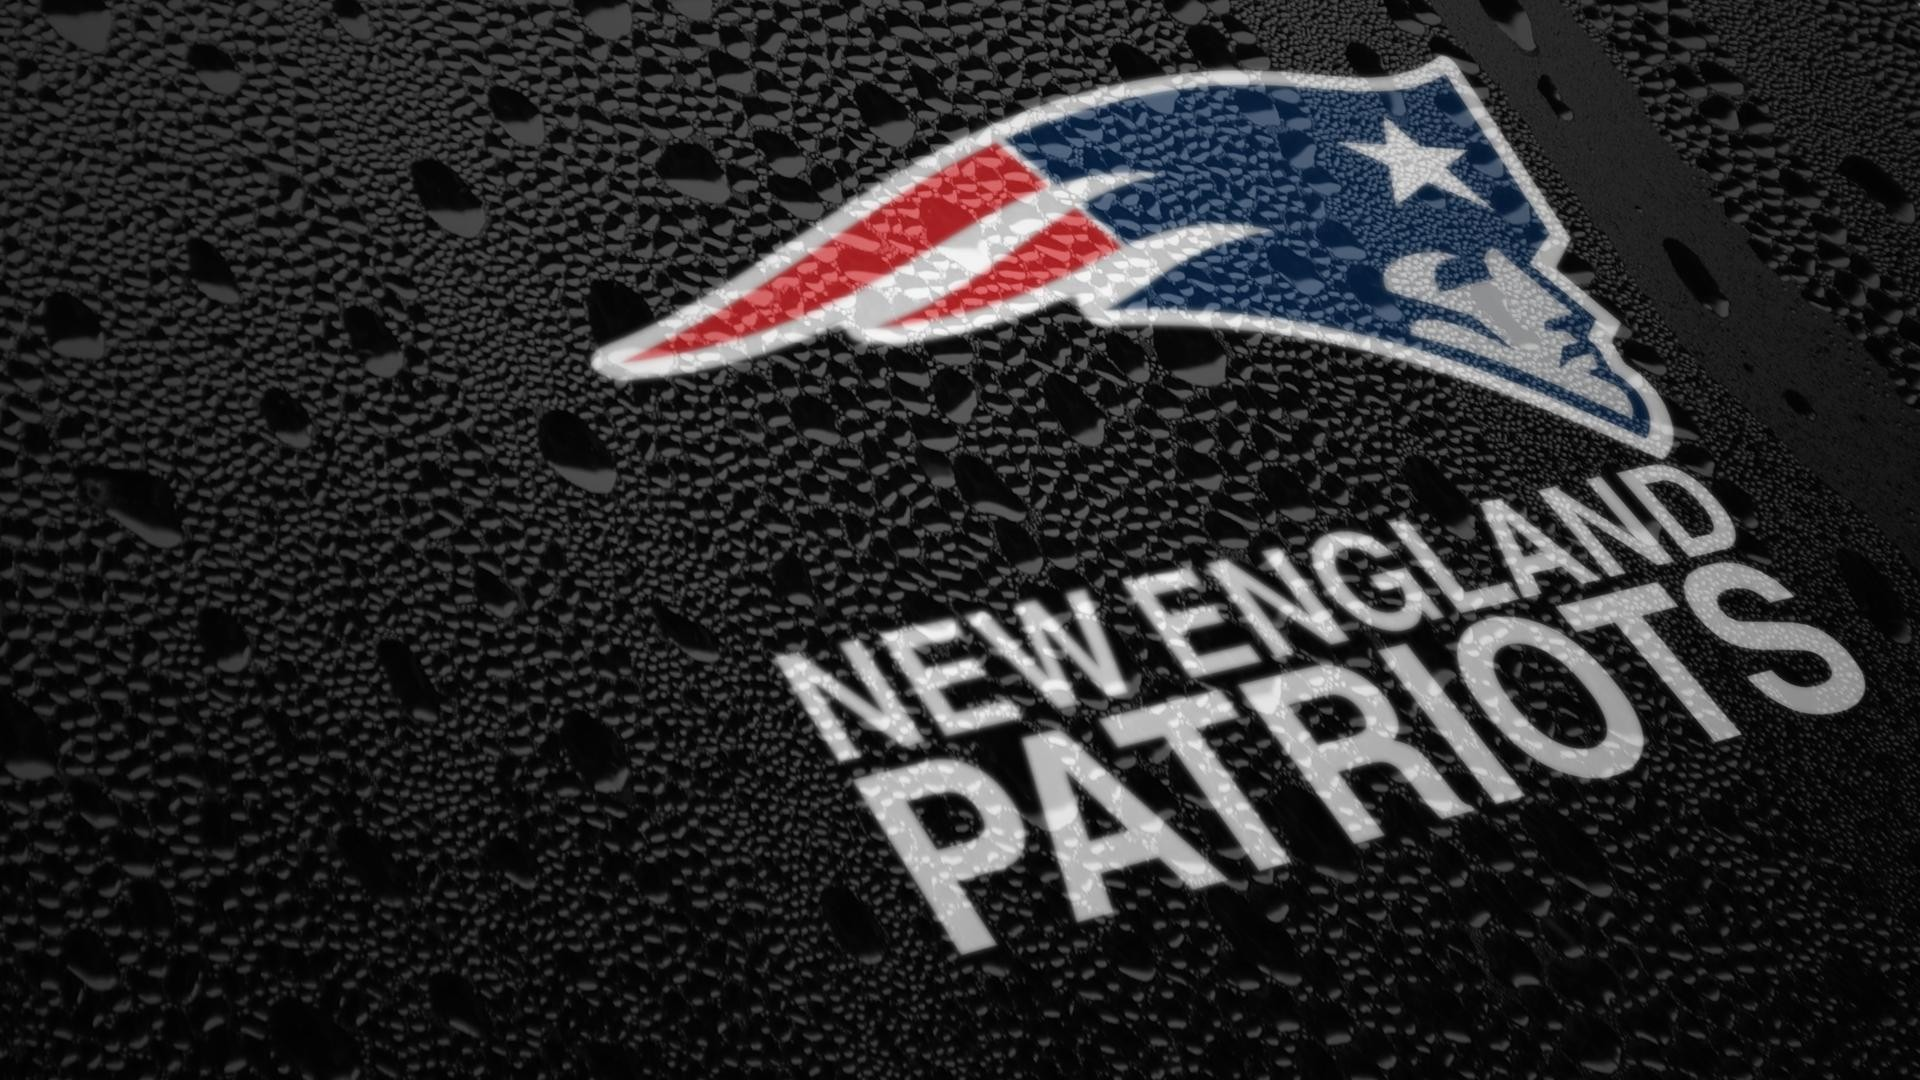 New England Patriots wallpaper ·① Download free High ...